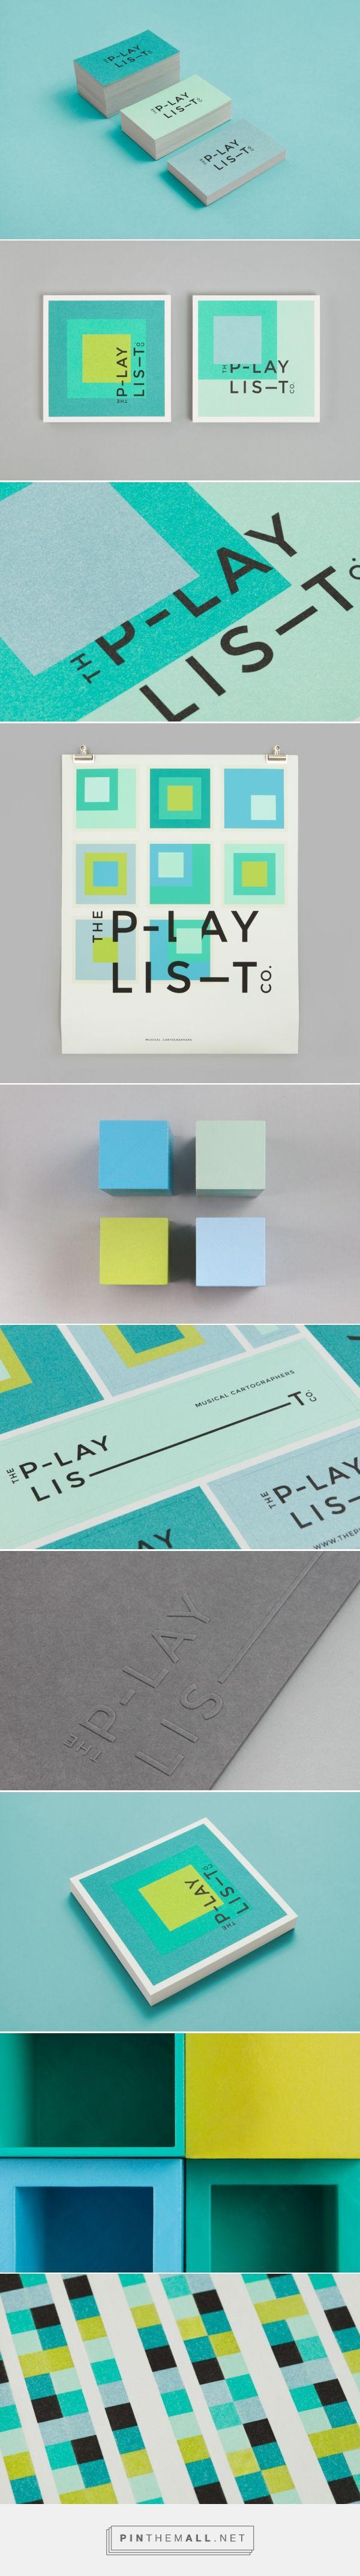 The Playlist Co. Branding on Behance | Fivestar Branding – Design and Branding Agency & Inspiration Gallery